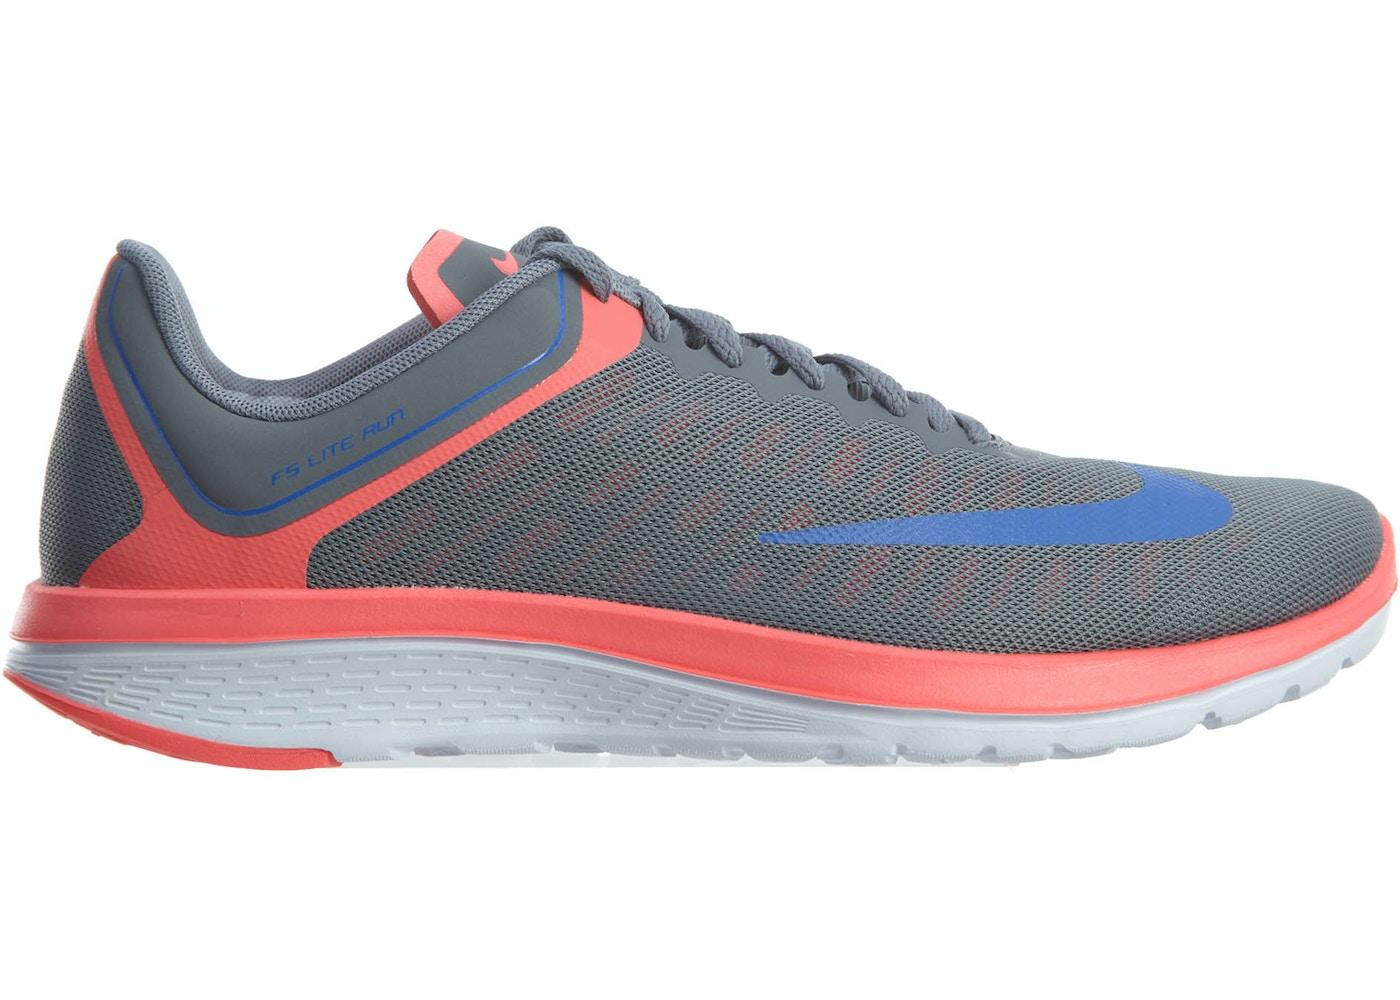 Burro Monumental niebla tóxica  Nike Fs Lite Run 4 Cool Grey Medium Blue (W) - 852448-005